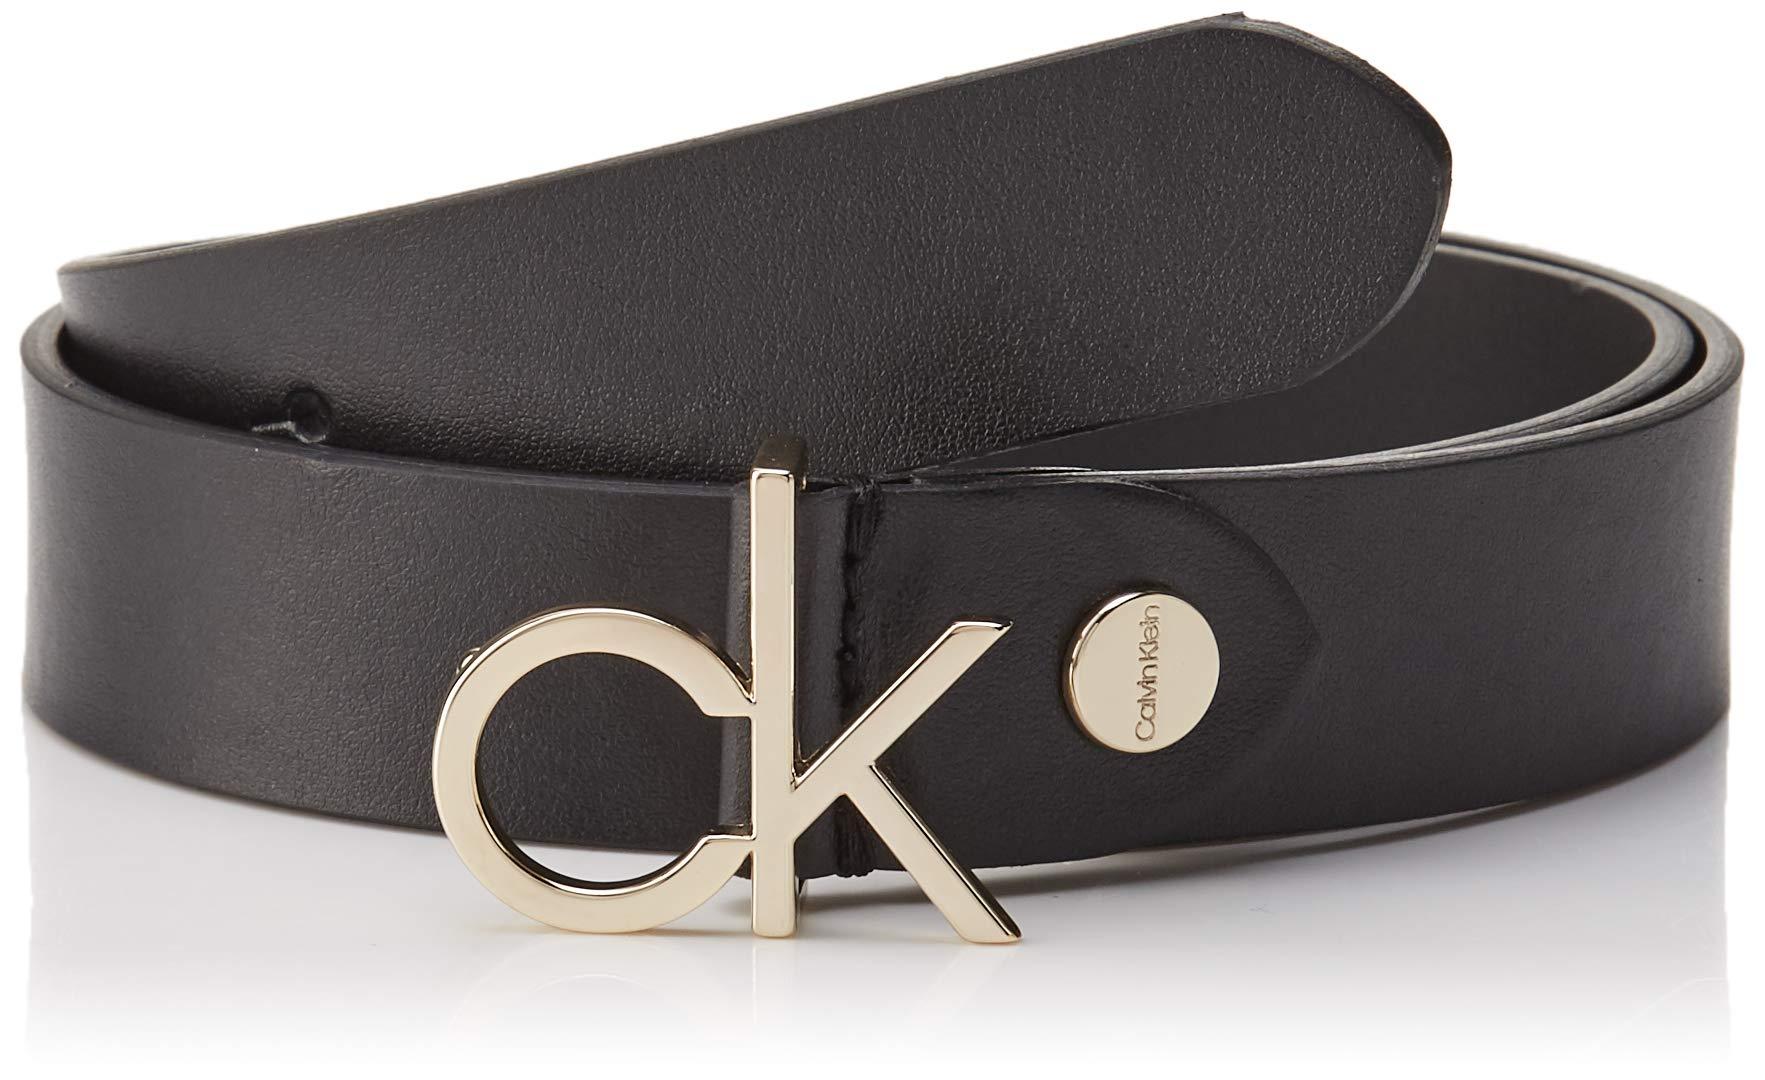 001110taille Adj Calvin Belt Ck Fabricant95Femme Low Klein CeintureNoirblack 3cm buckle OmnN80vw